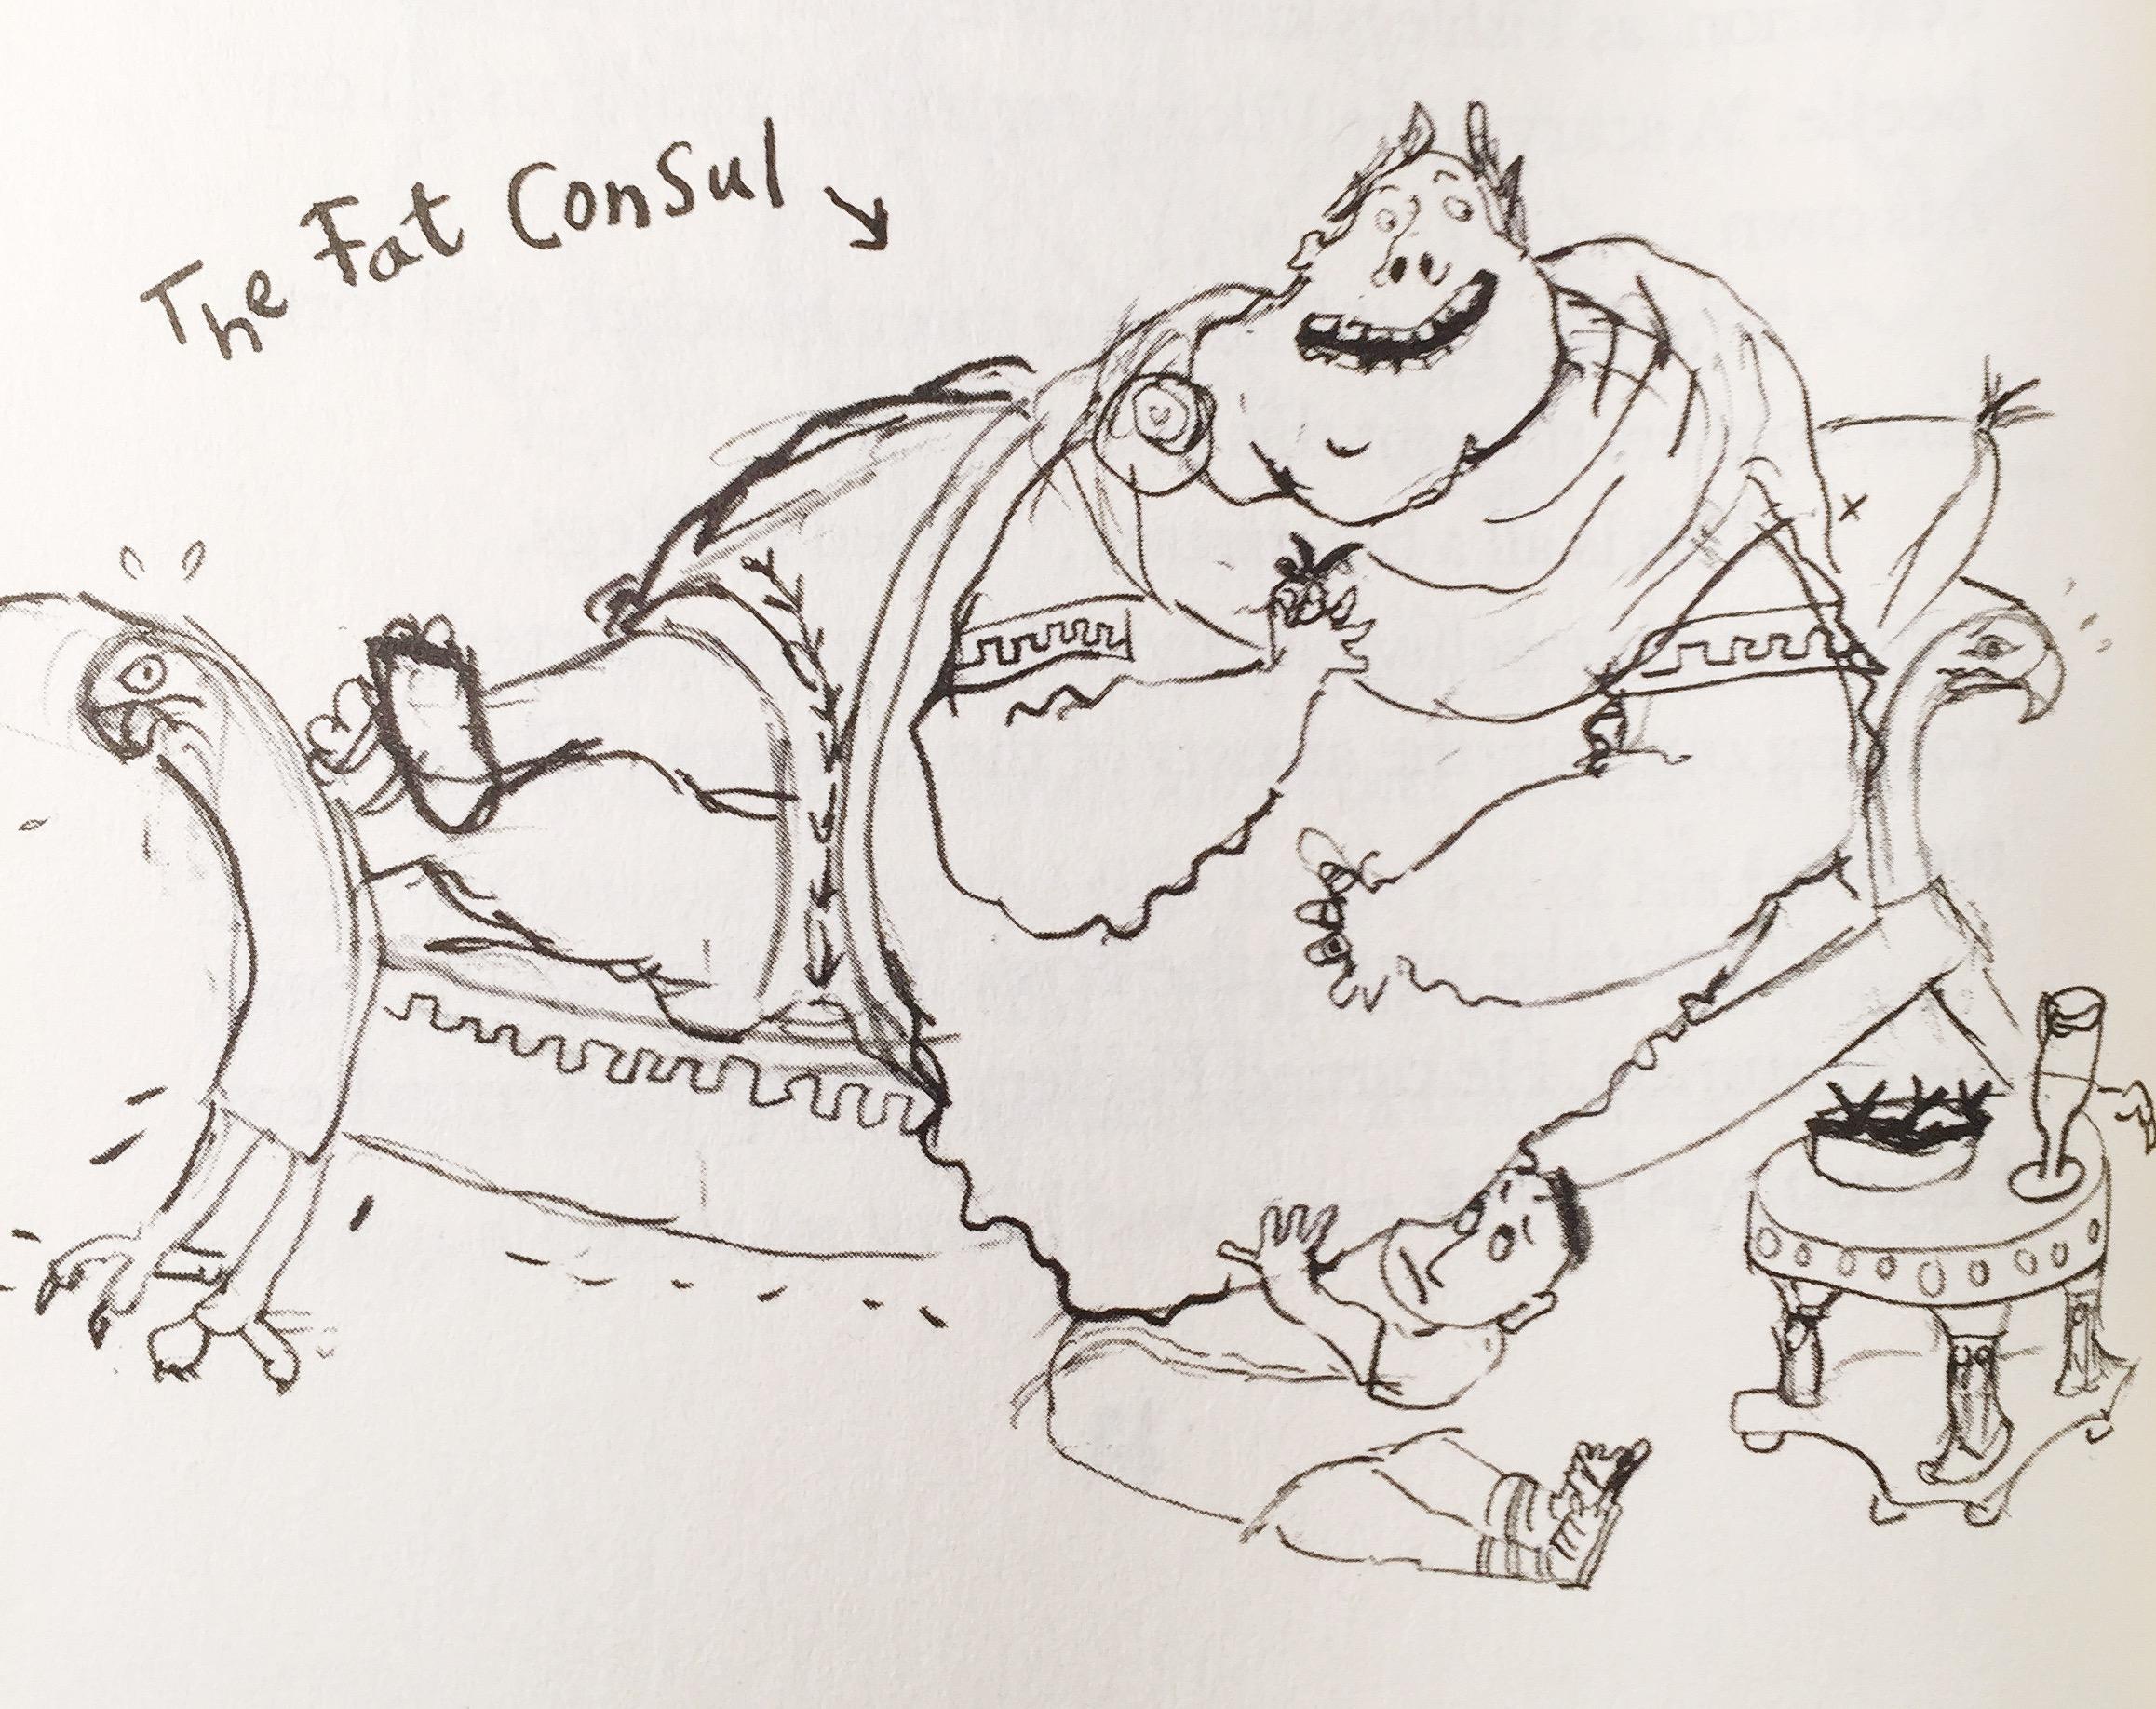 Fat Consul